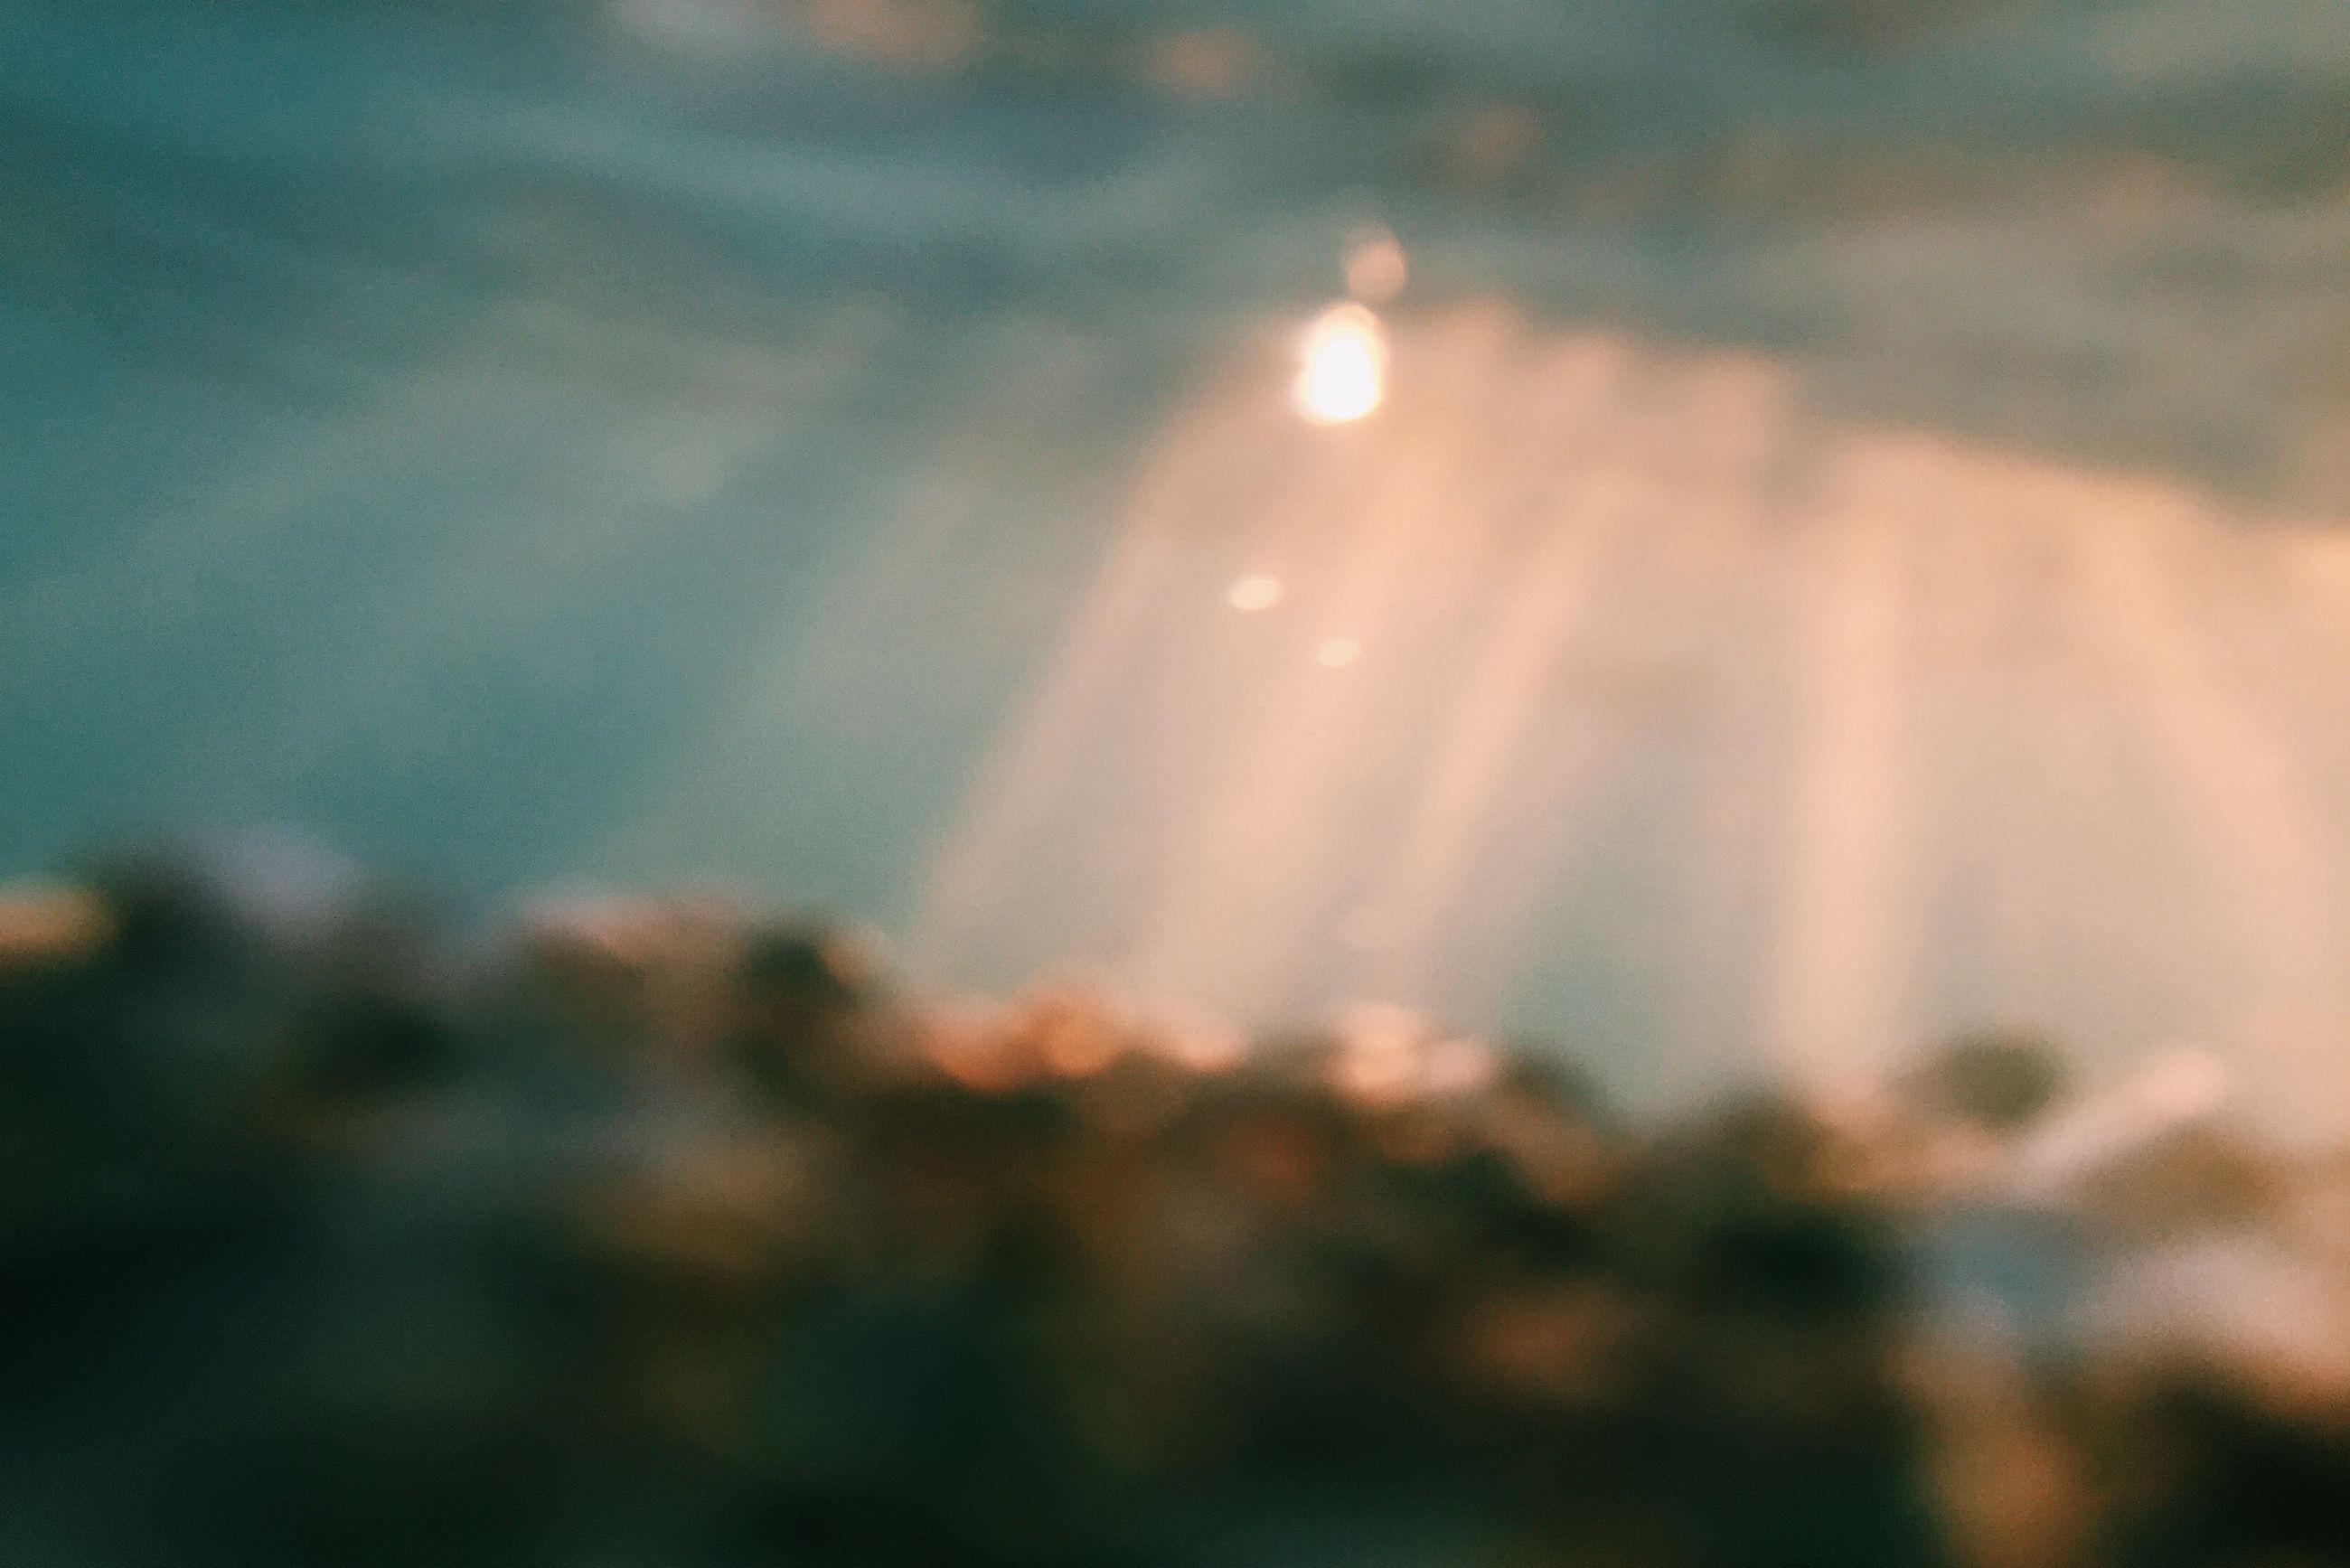 illuminated, defocused, selective focus, lens flare, focus on foreground, sky, night, sunset, outdoors, dusk, light - natural phenomenon, no people, close-up, city, lighting equipment, building exterior, sunlight, street, glowing, cloud - sky